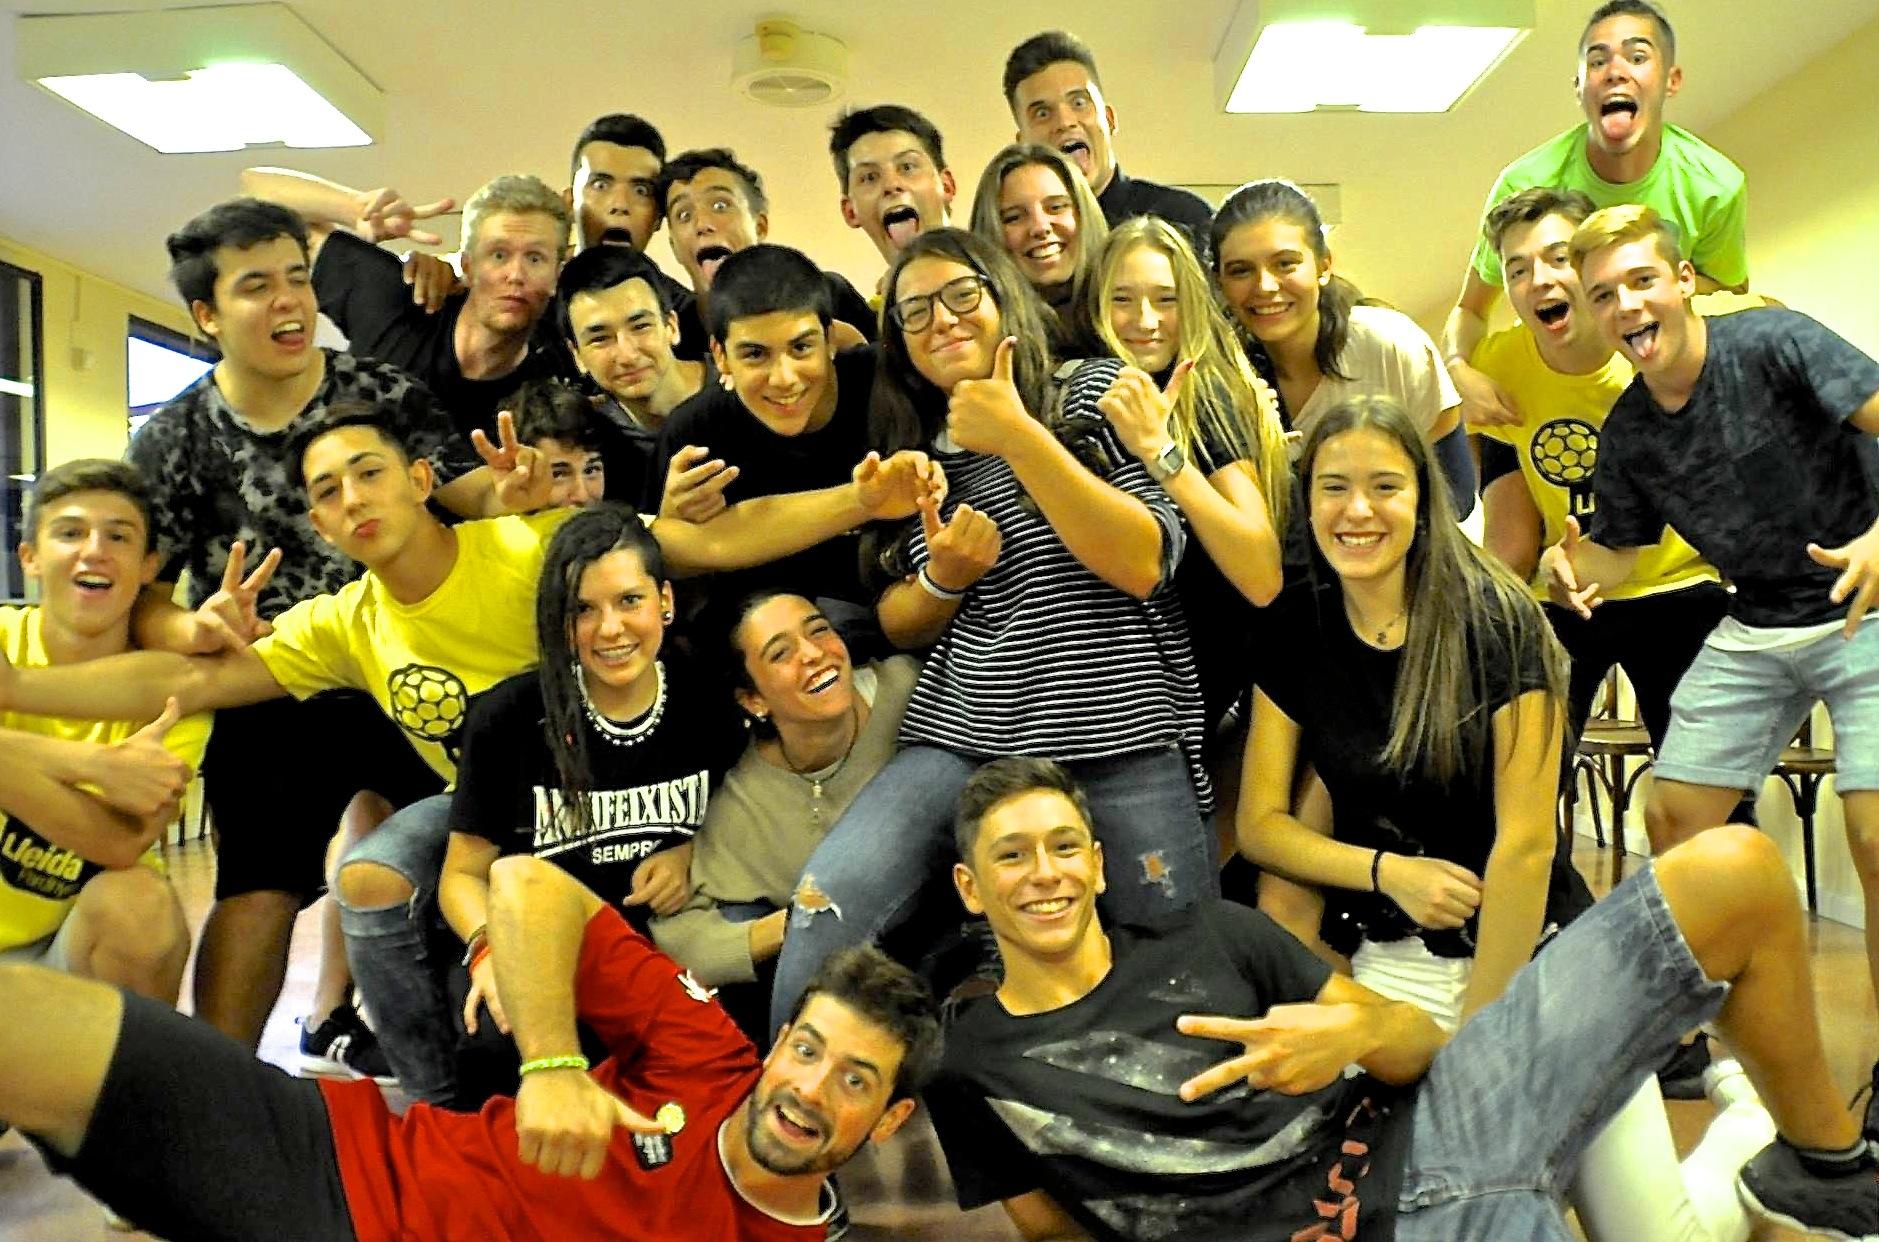 Handbol-Lleida-Esports-amb-valors-5